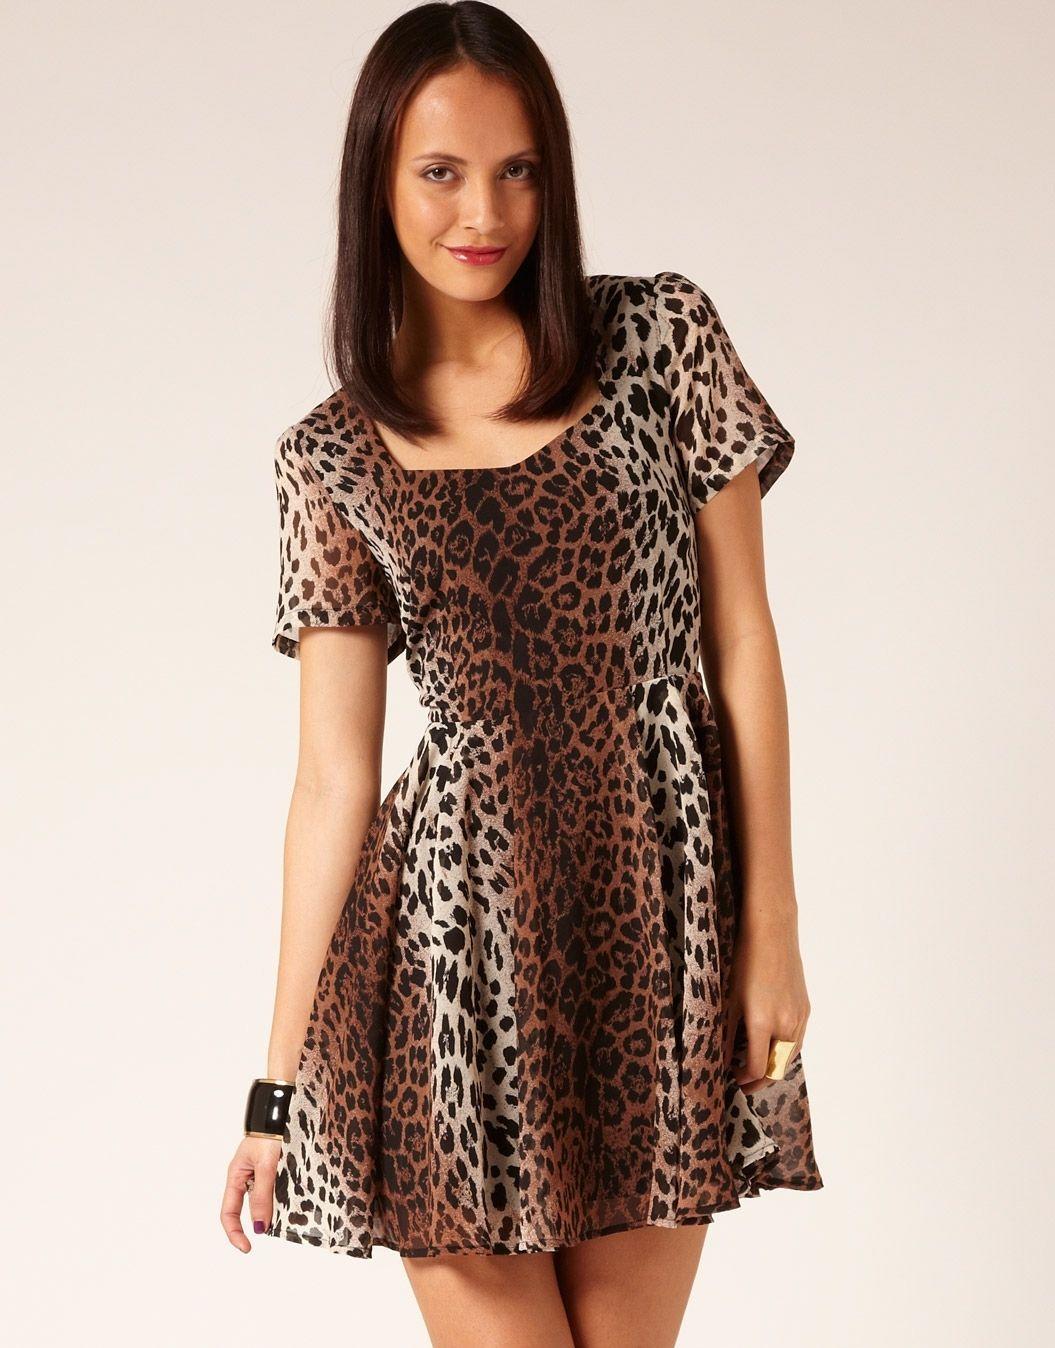 Glassons - Animal Print Dress ($49.99) | Ropas | Pinterest | Animal ...